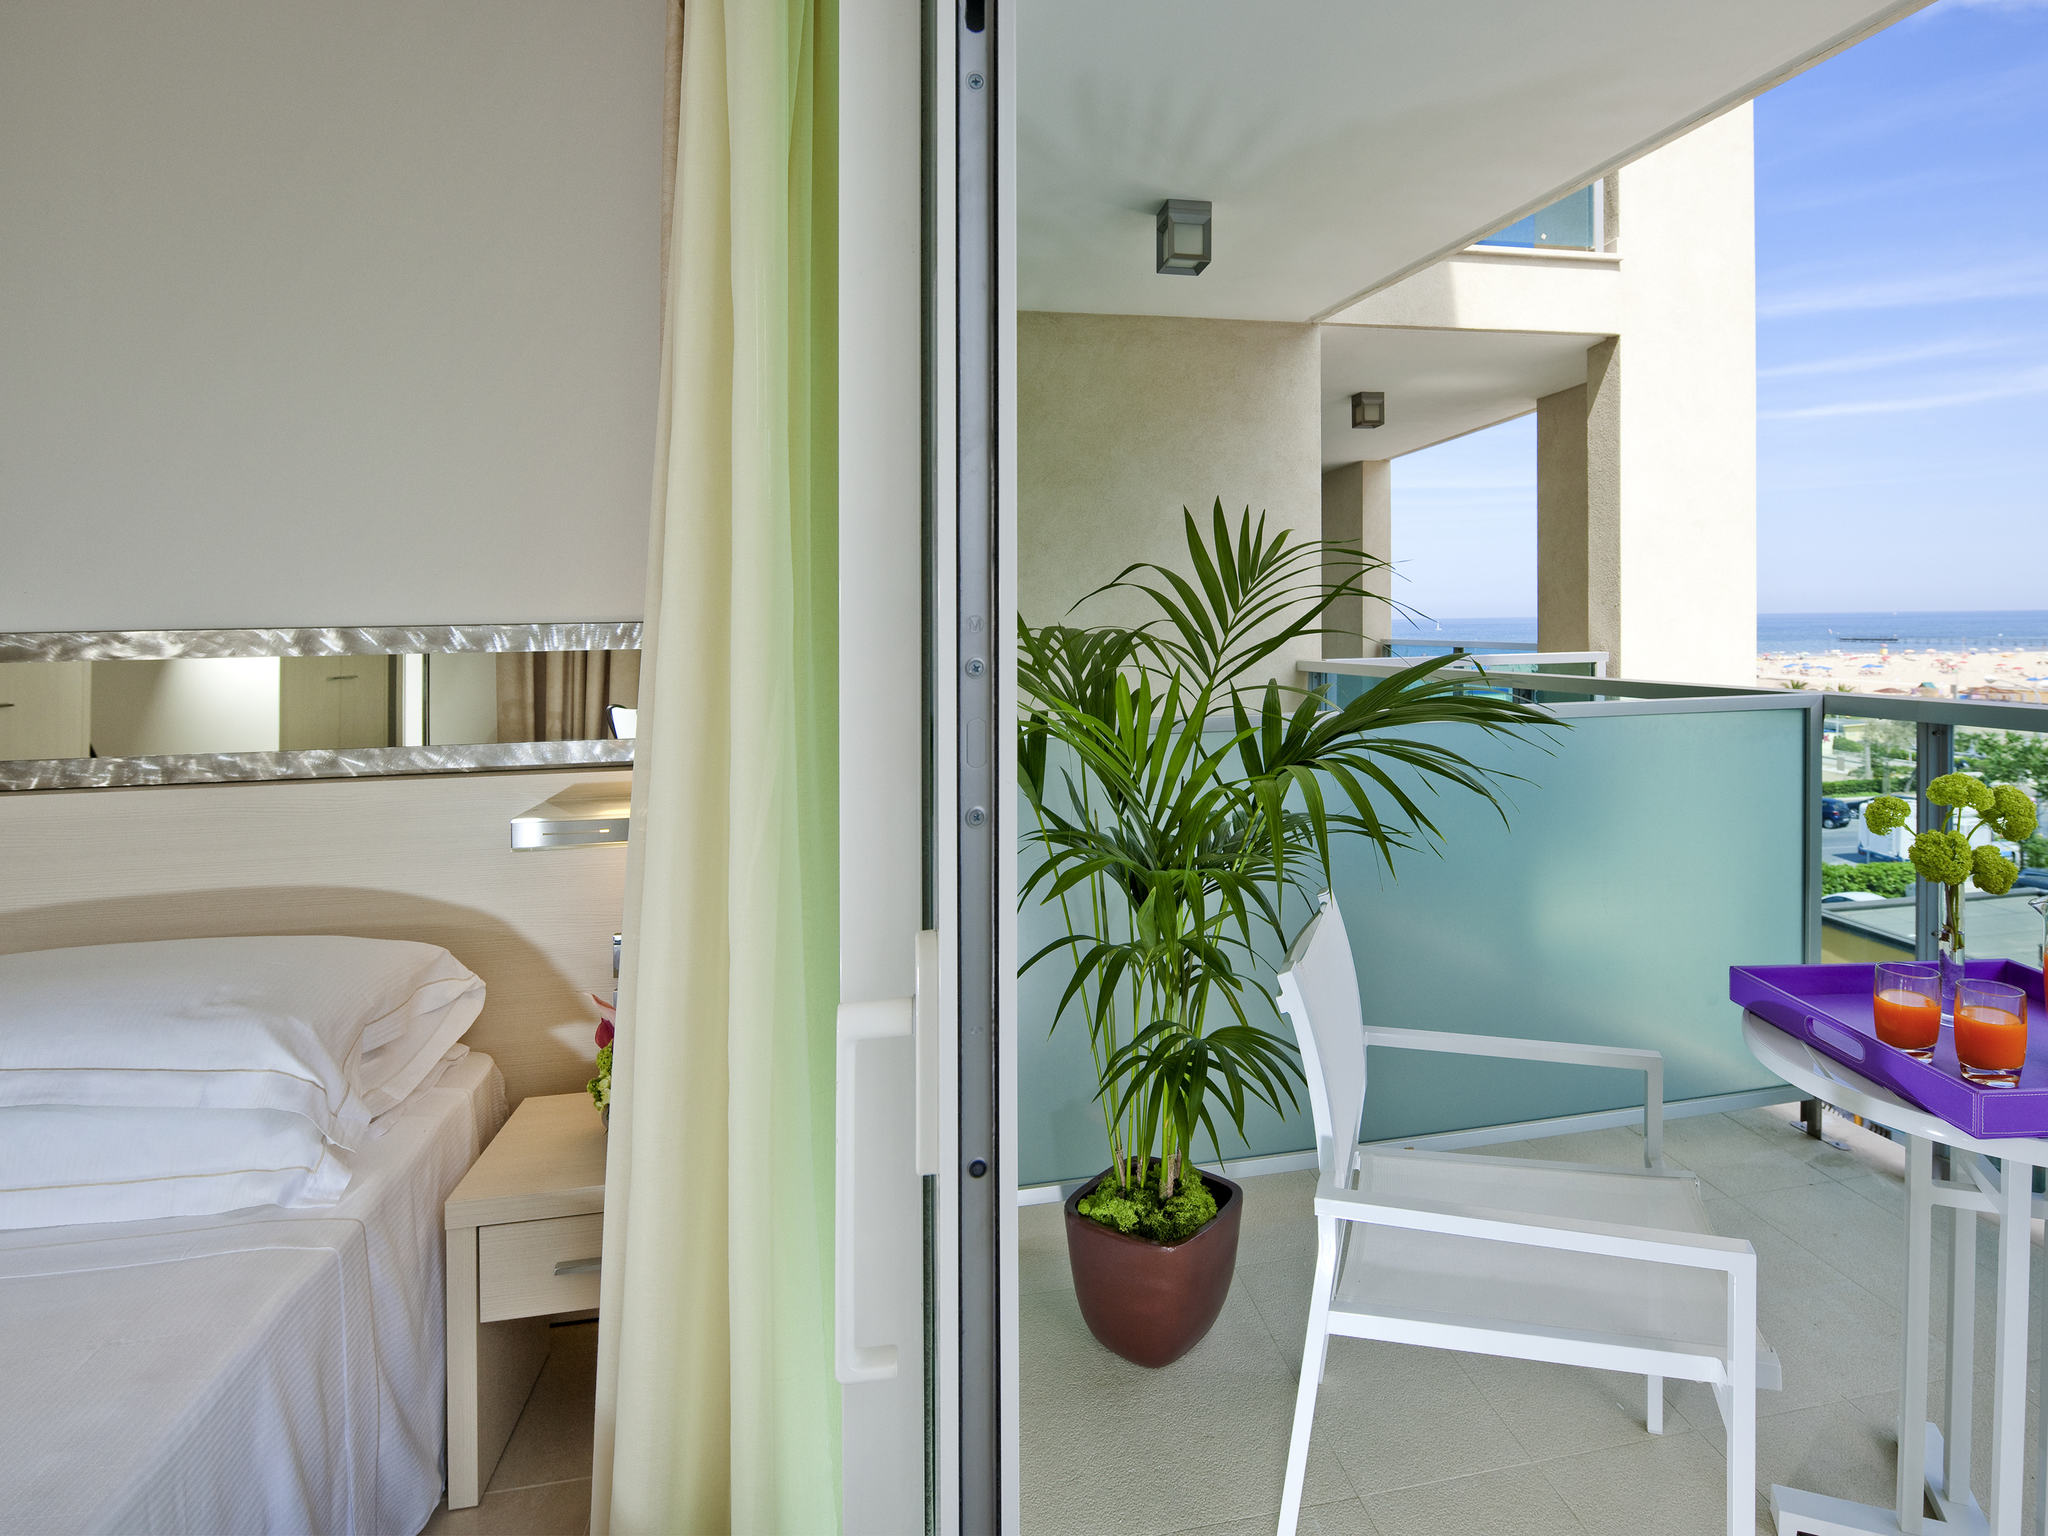 Hotel – Mercure Rimini Artis / otwarcie